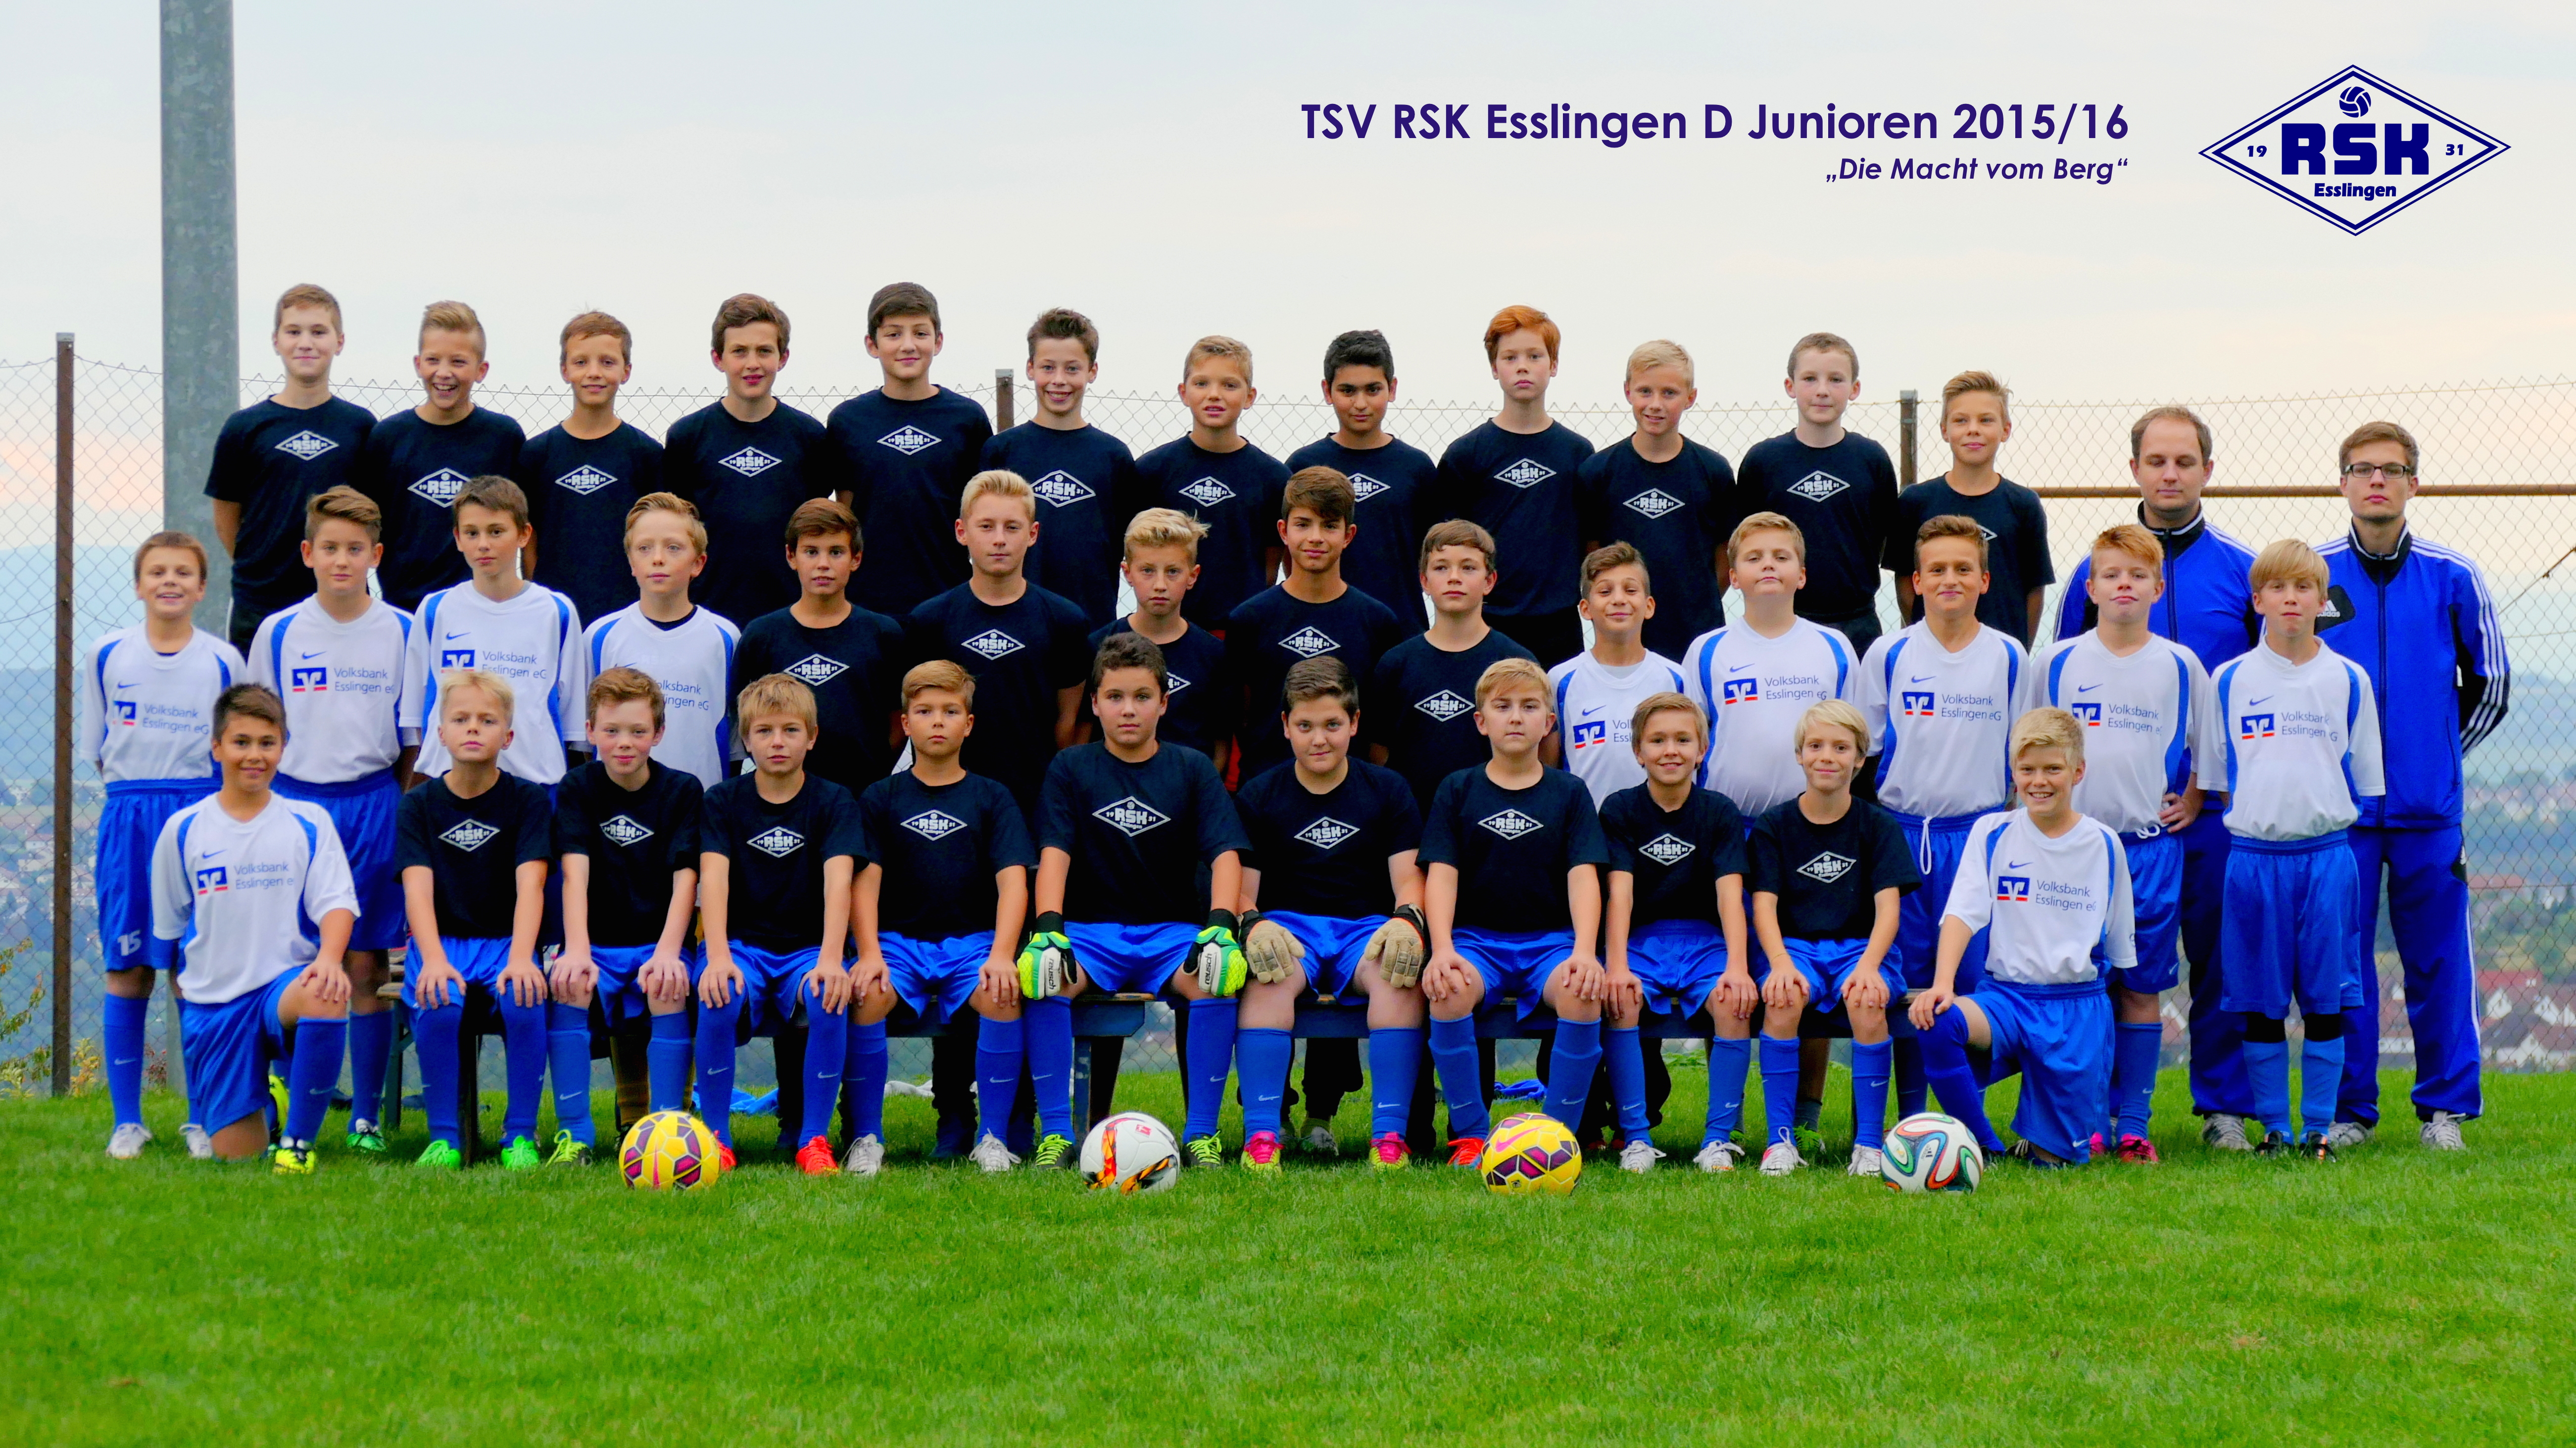 D Junioren 2015-16